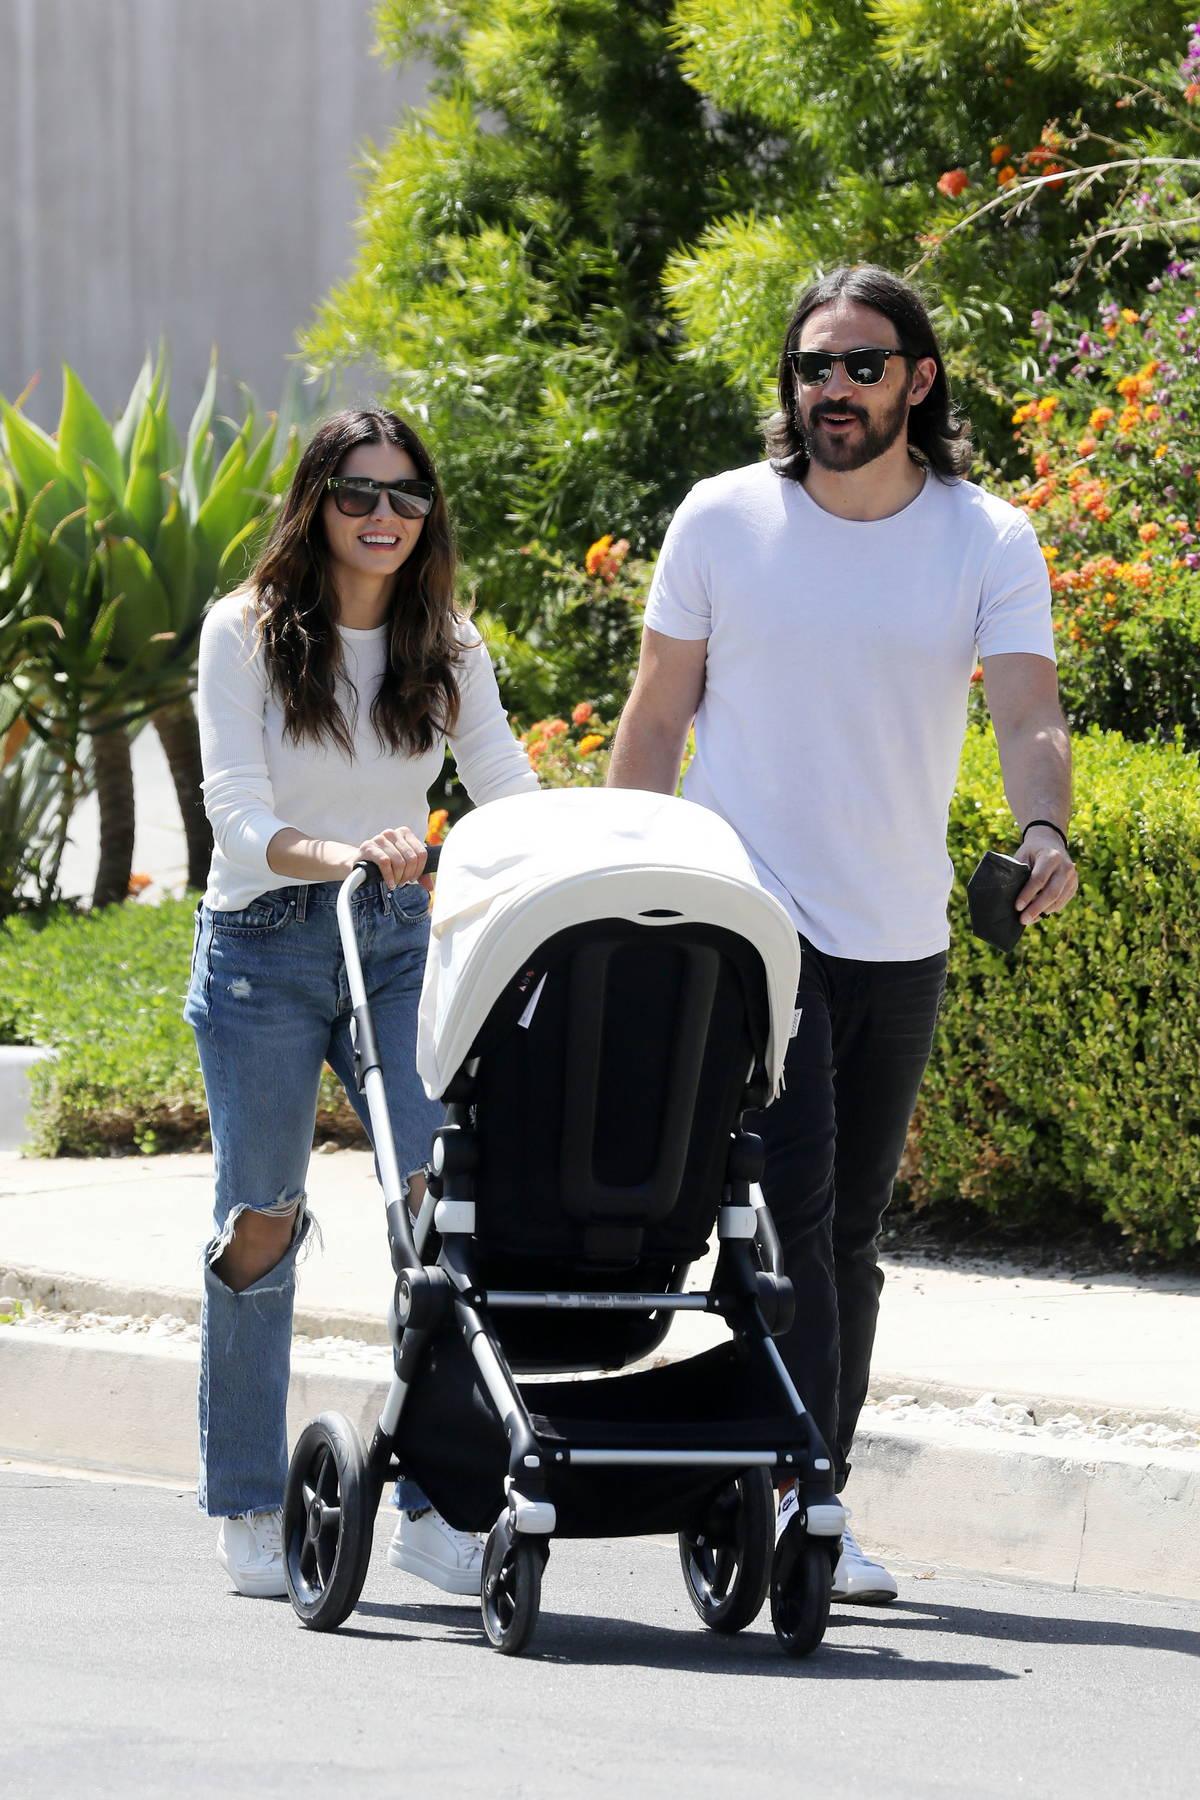 Jenna Dewan and Steve Kazee enjoy a leisurely stroll with their son in Los Angeles